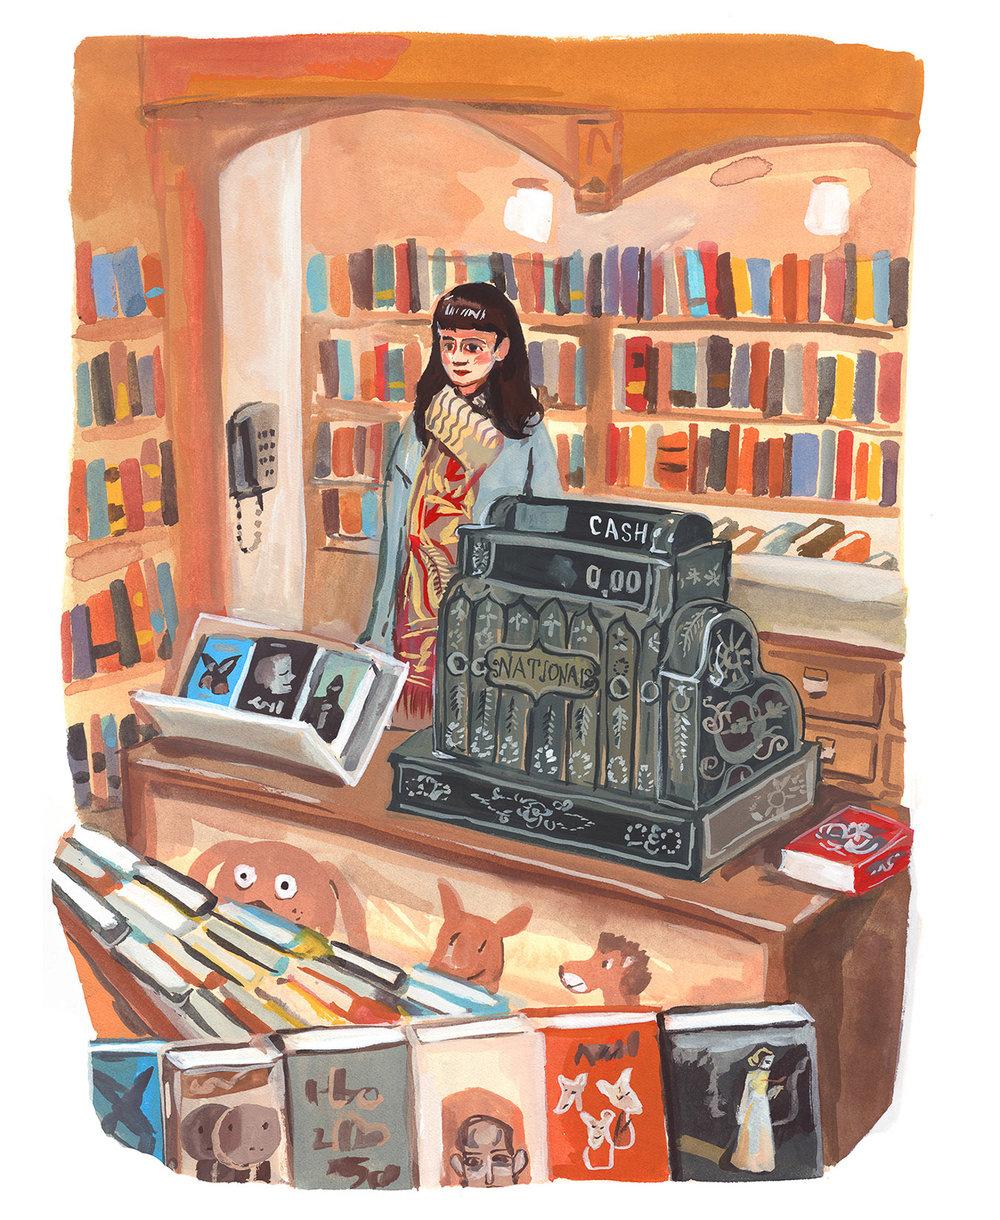 SOI 61 2018 - ARTIST: Jenny KroikTITLE: Corner Bookstore [2 of 7]